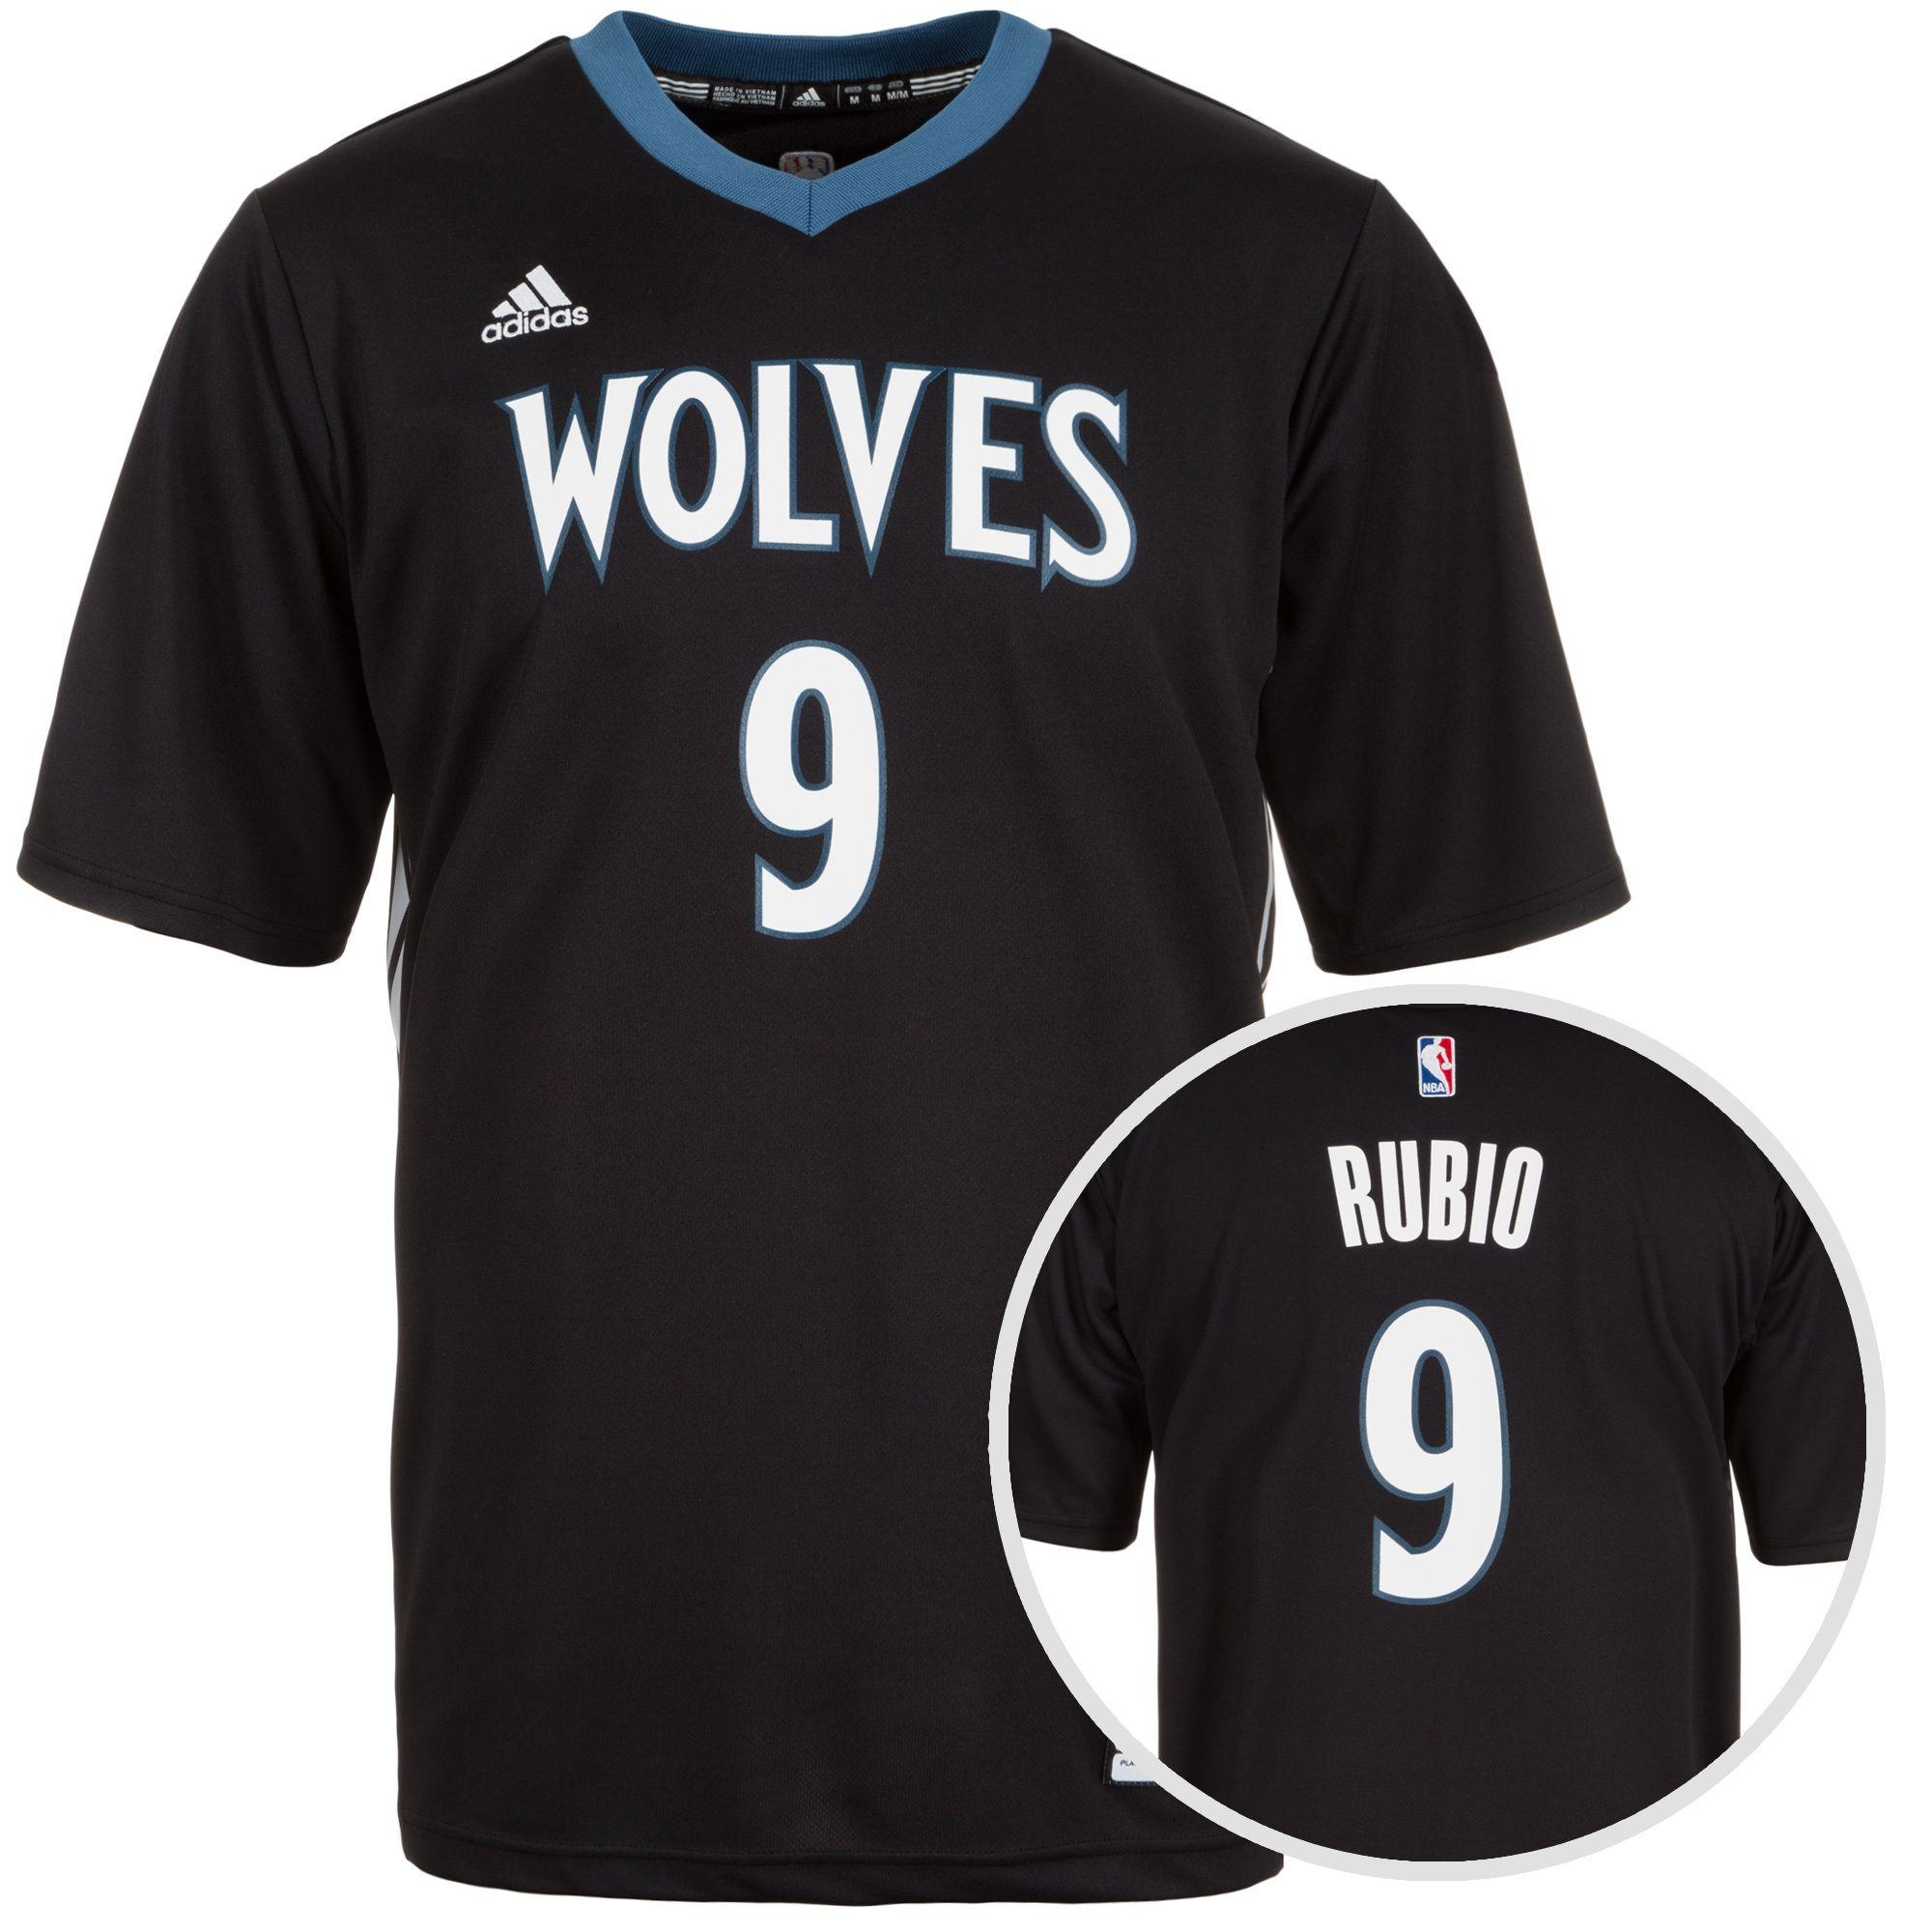 ADIDAS PERFORMANCE adidas Performance Minnesota Timberwolves Rubio Replica Basketballtrikot Herren